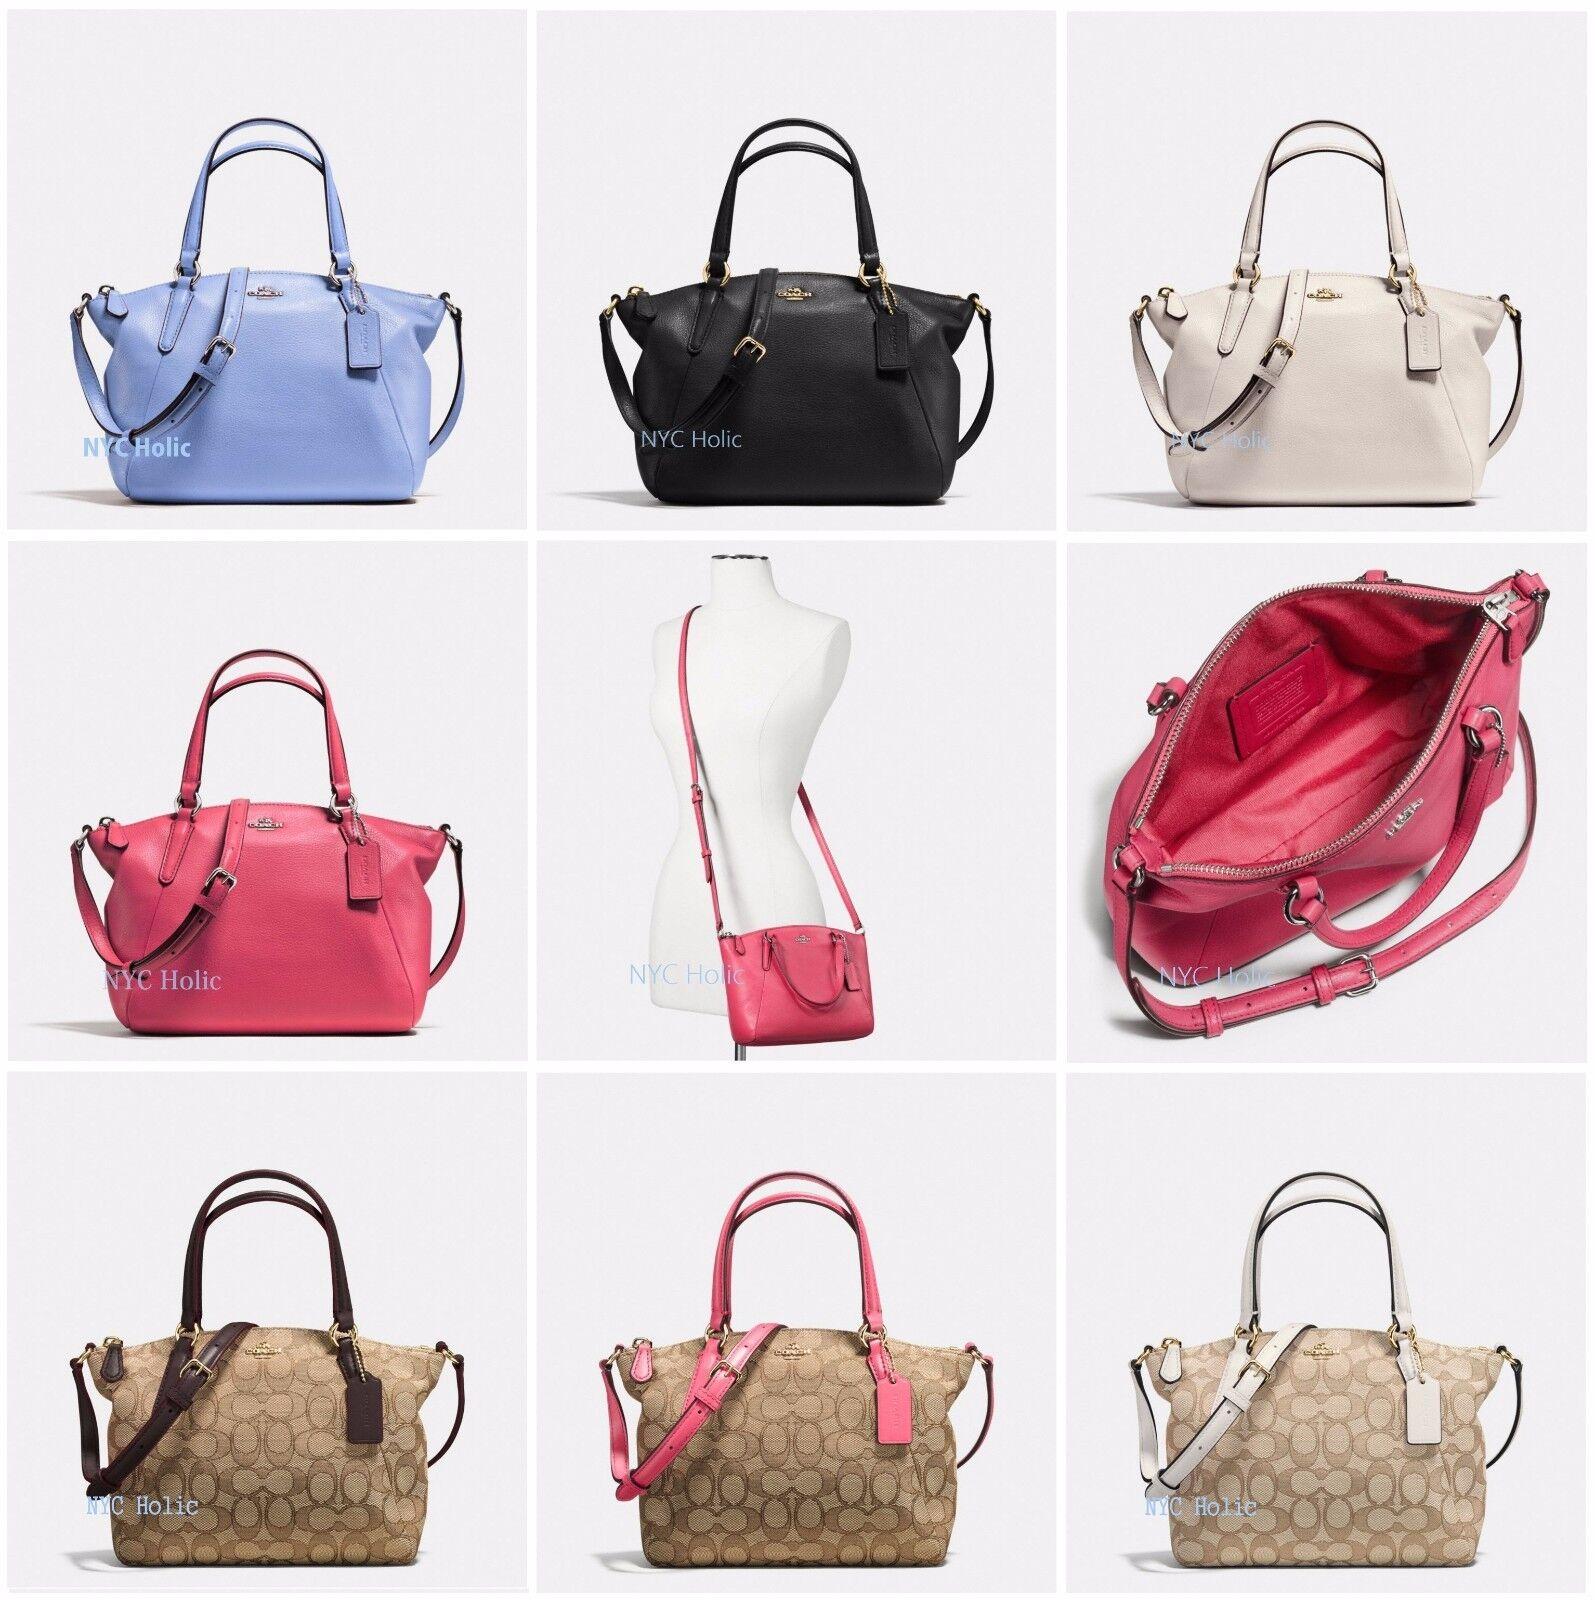 Coach F36675 Small Kelsey Pebble Leather Satchel Handbag Chalk for ... a36eb4962f555